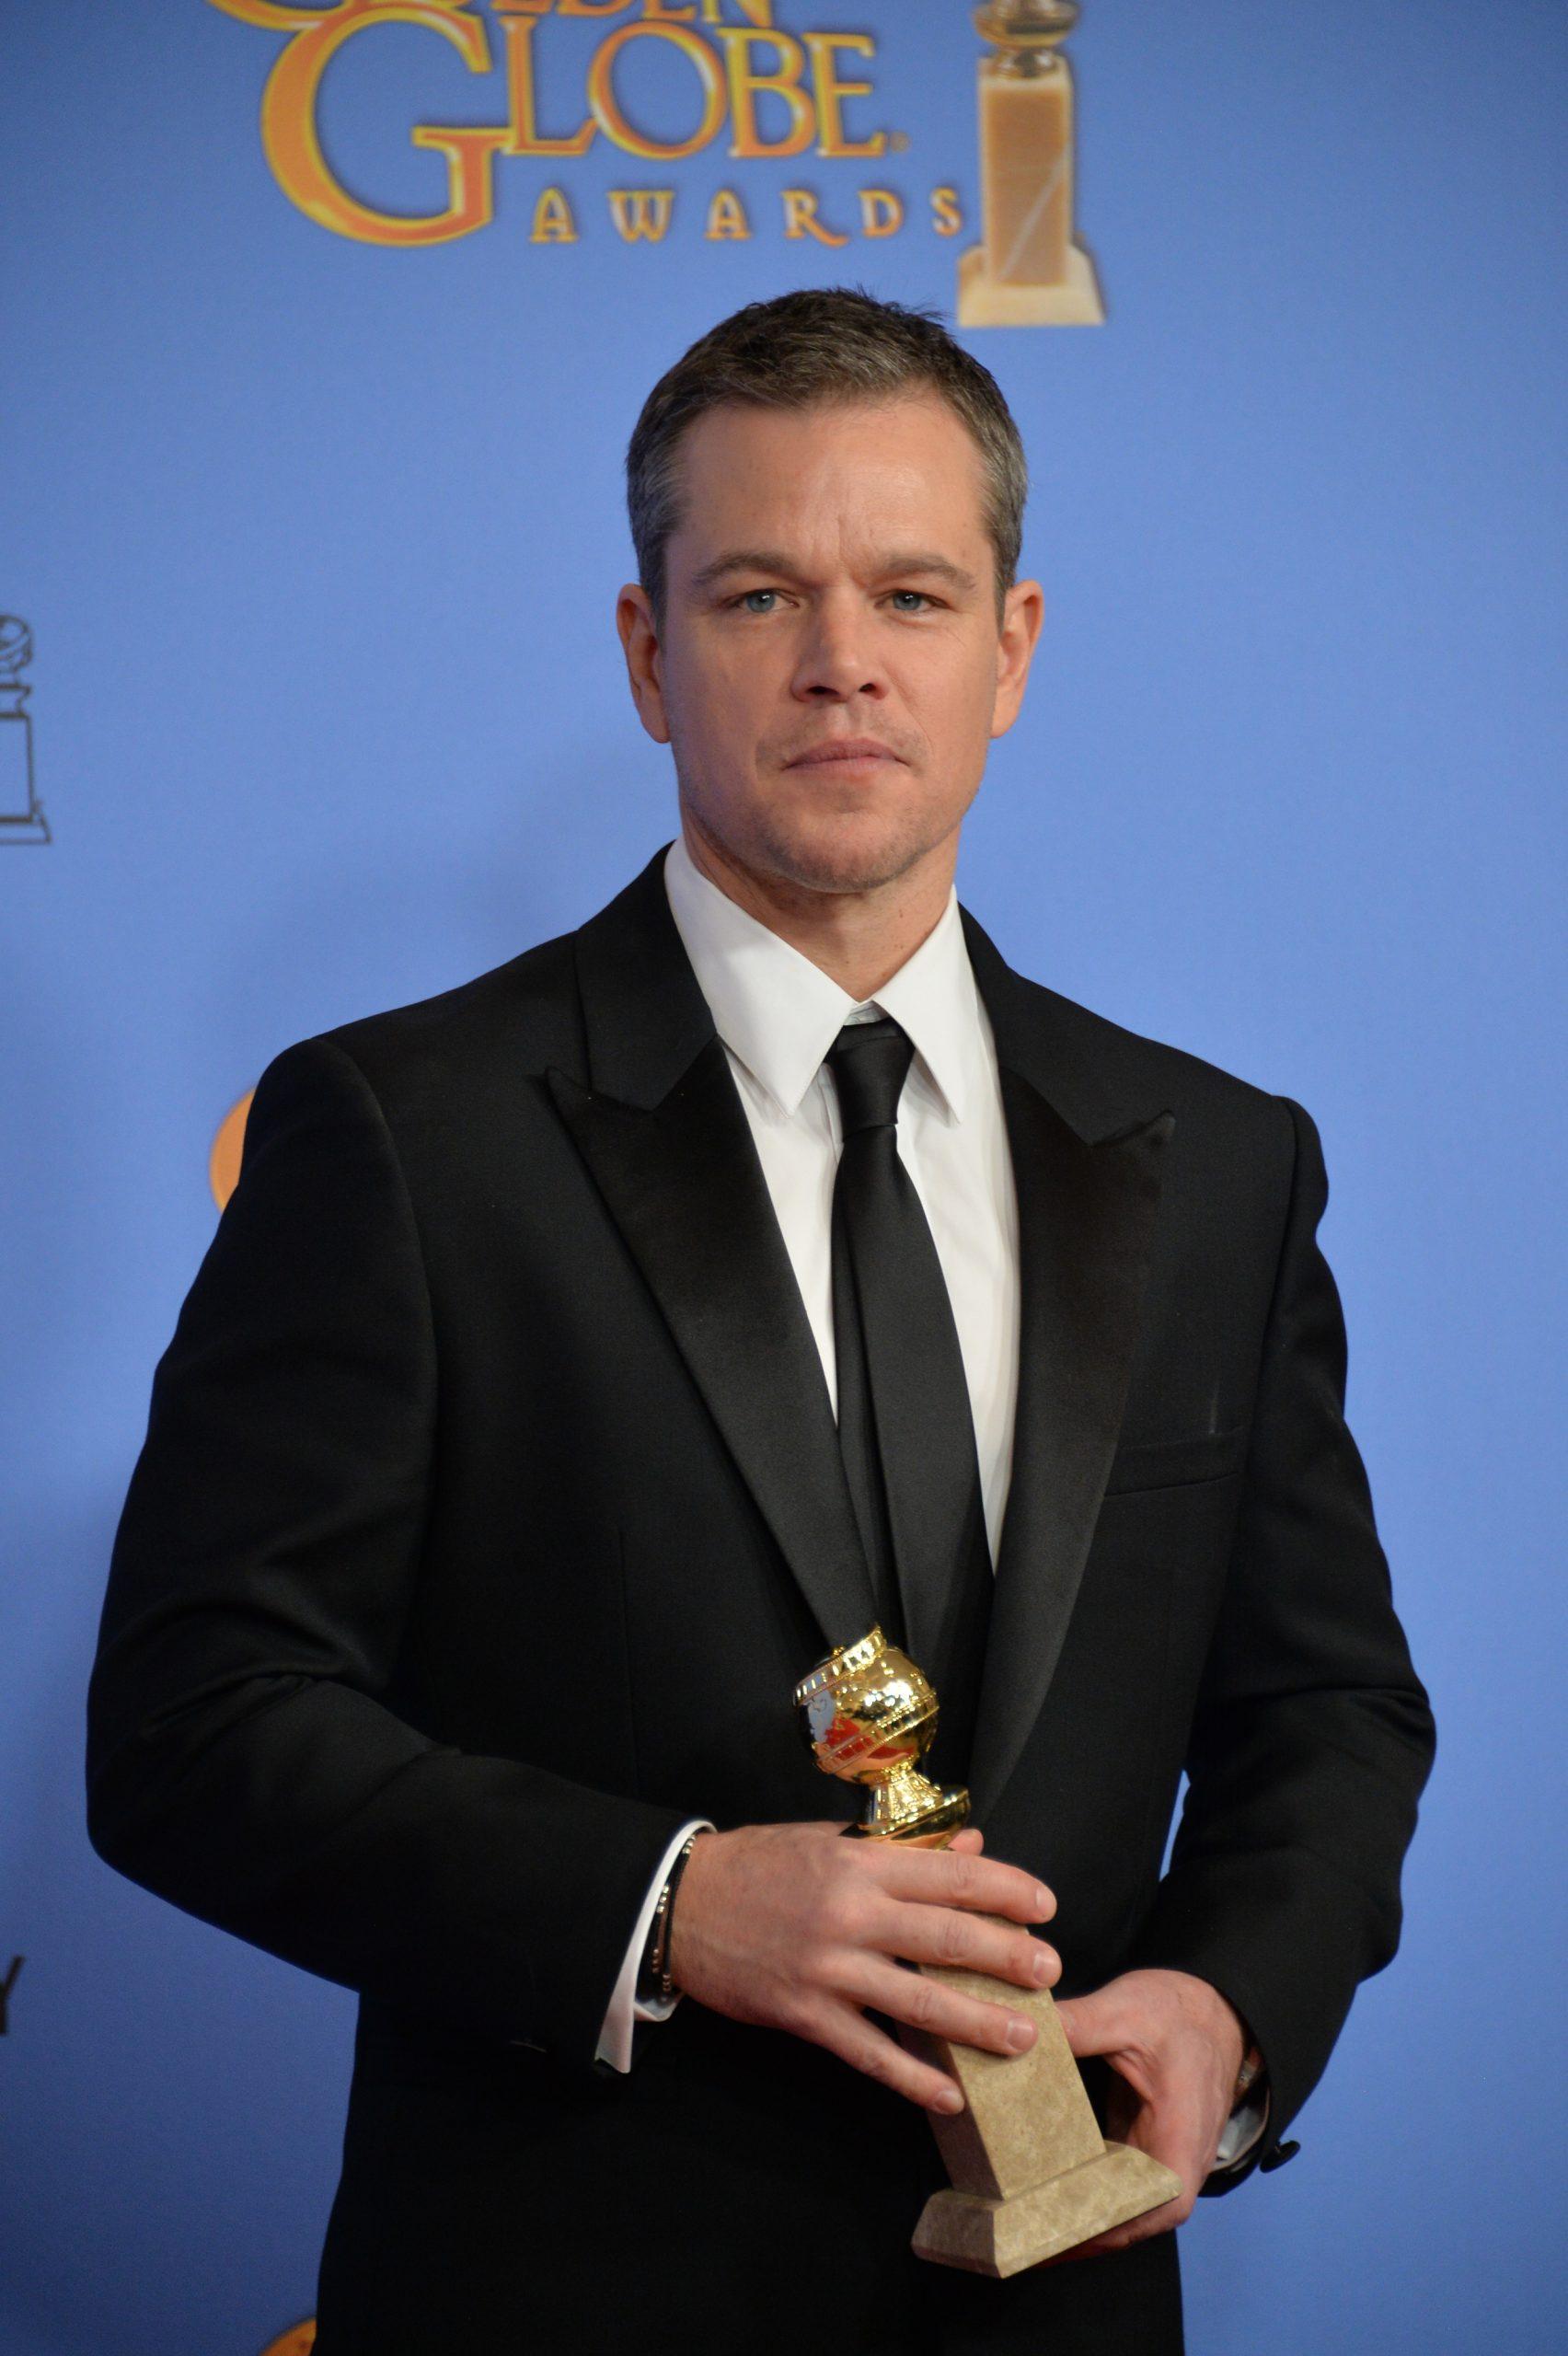 Matt Damon holding a Golden Globe